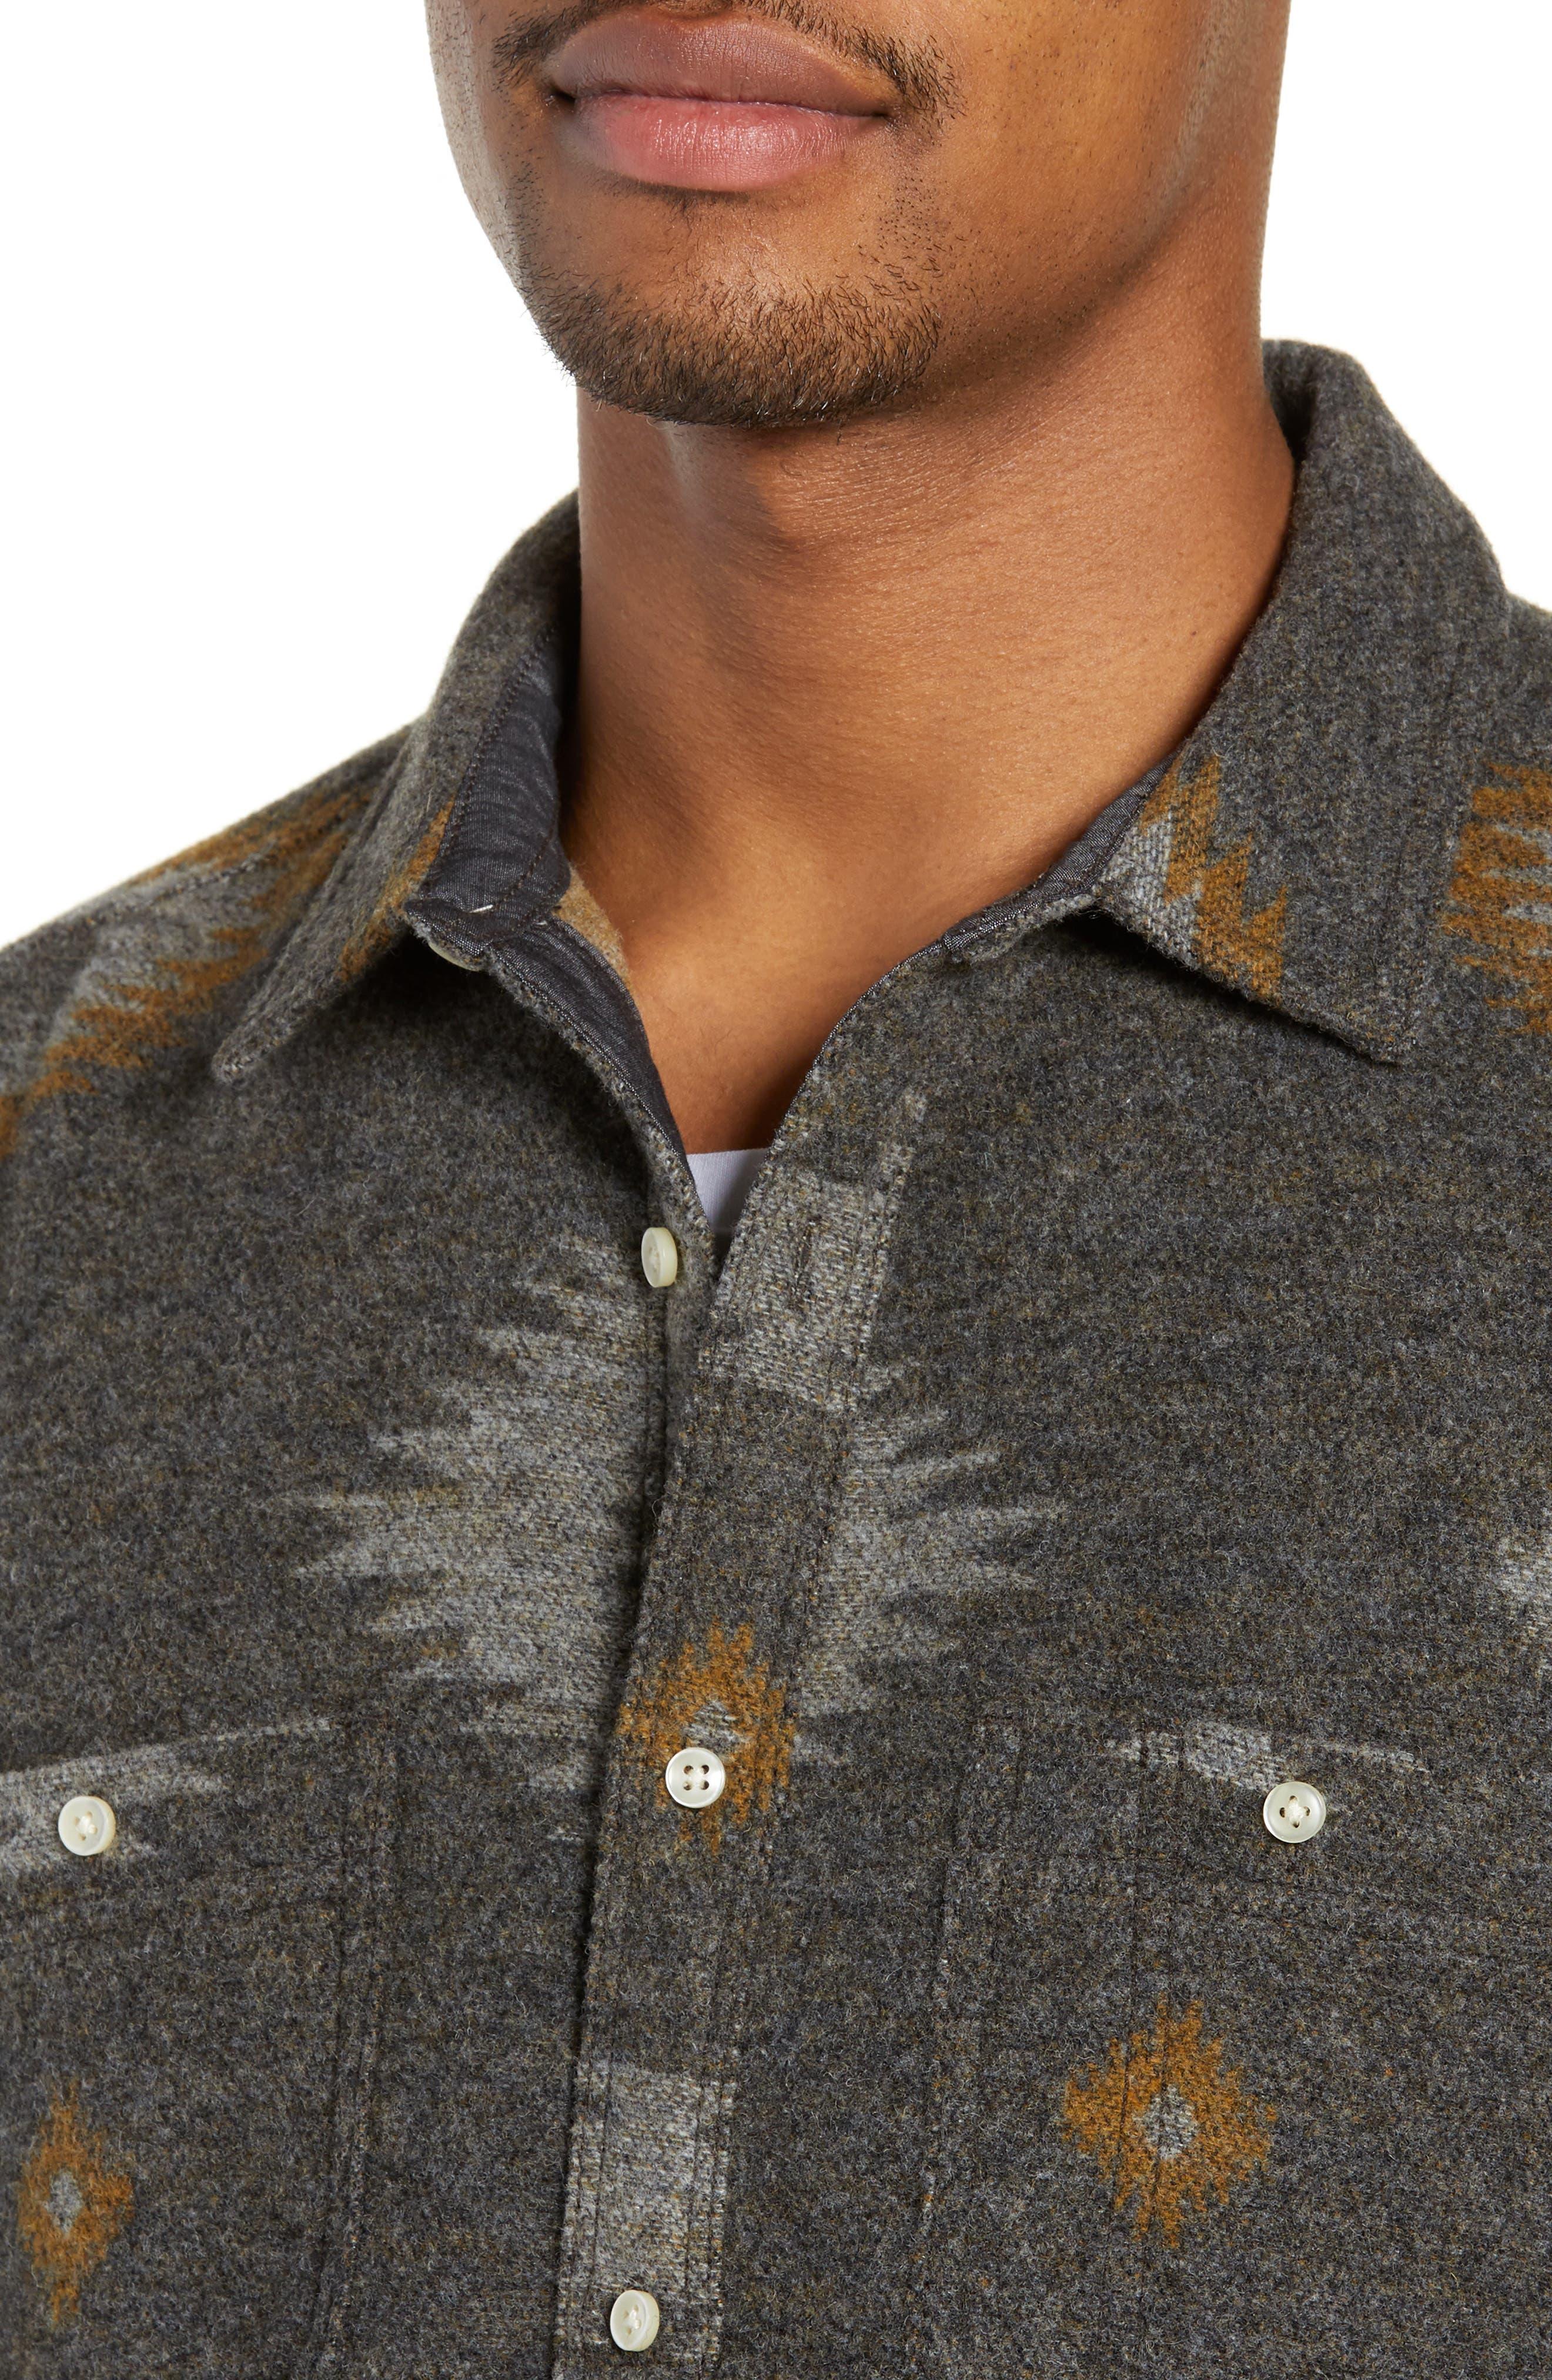 Warrior Regular Fit Wool Blend Shirt Jacket,                             Alternate thumbnail 2, color,                             HEATHER CHARCOAL